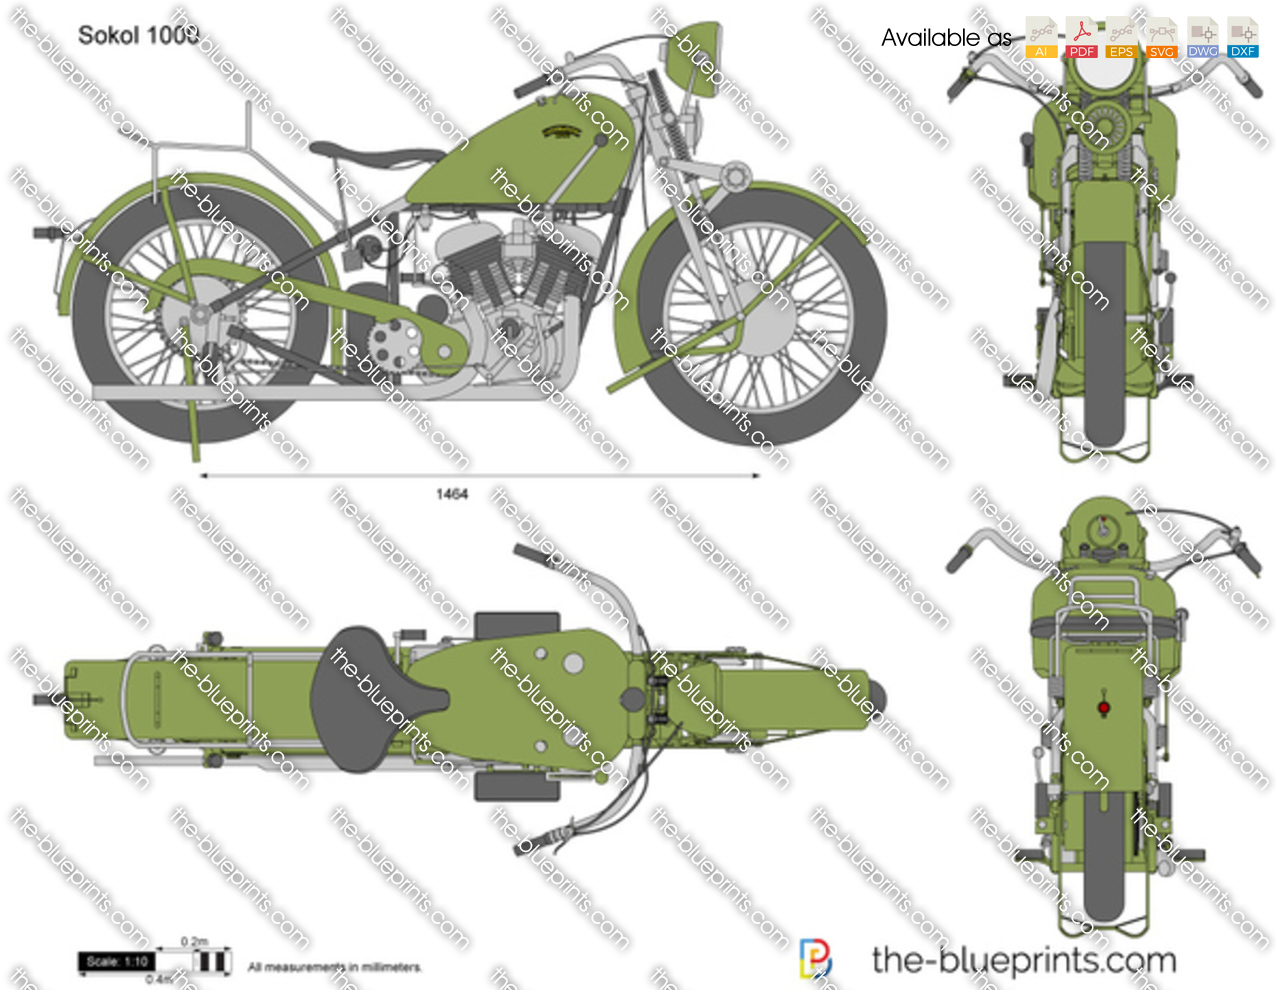 Sokol 1000 1939